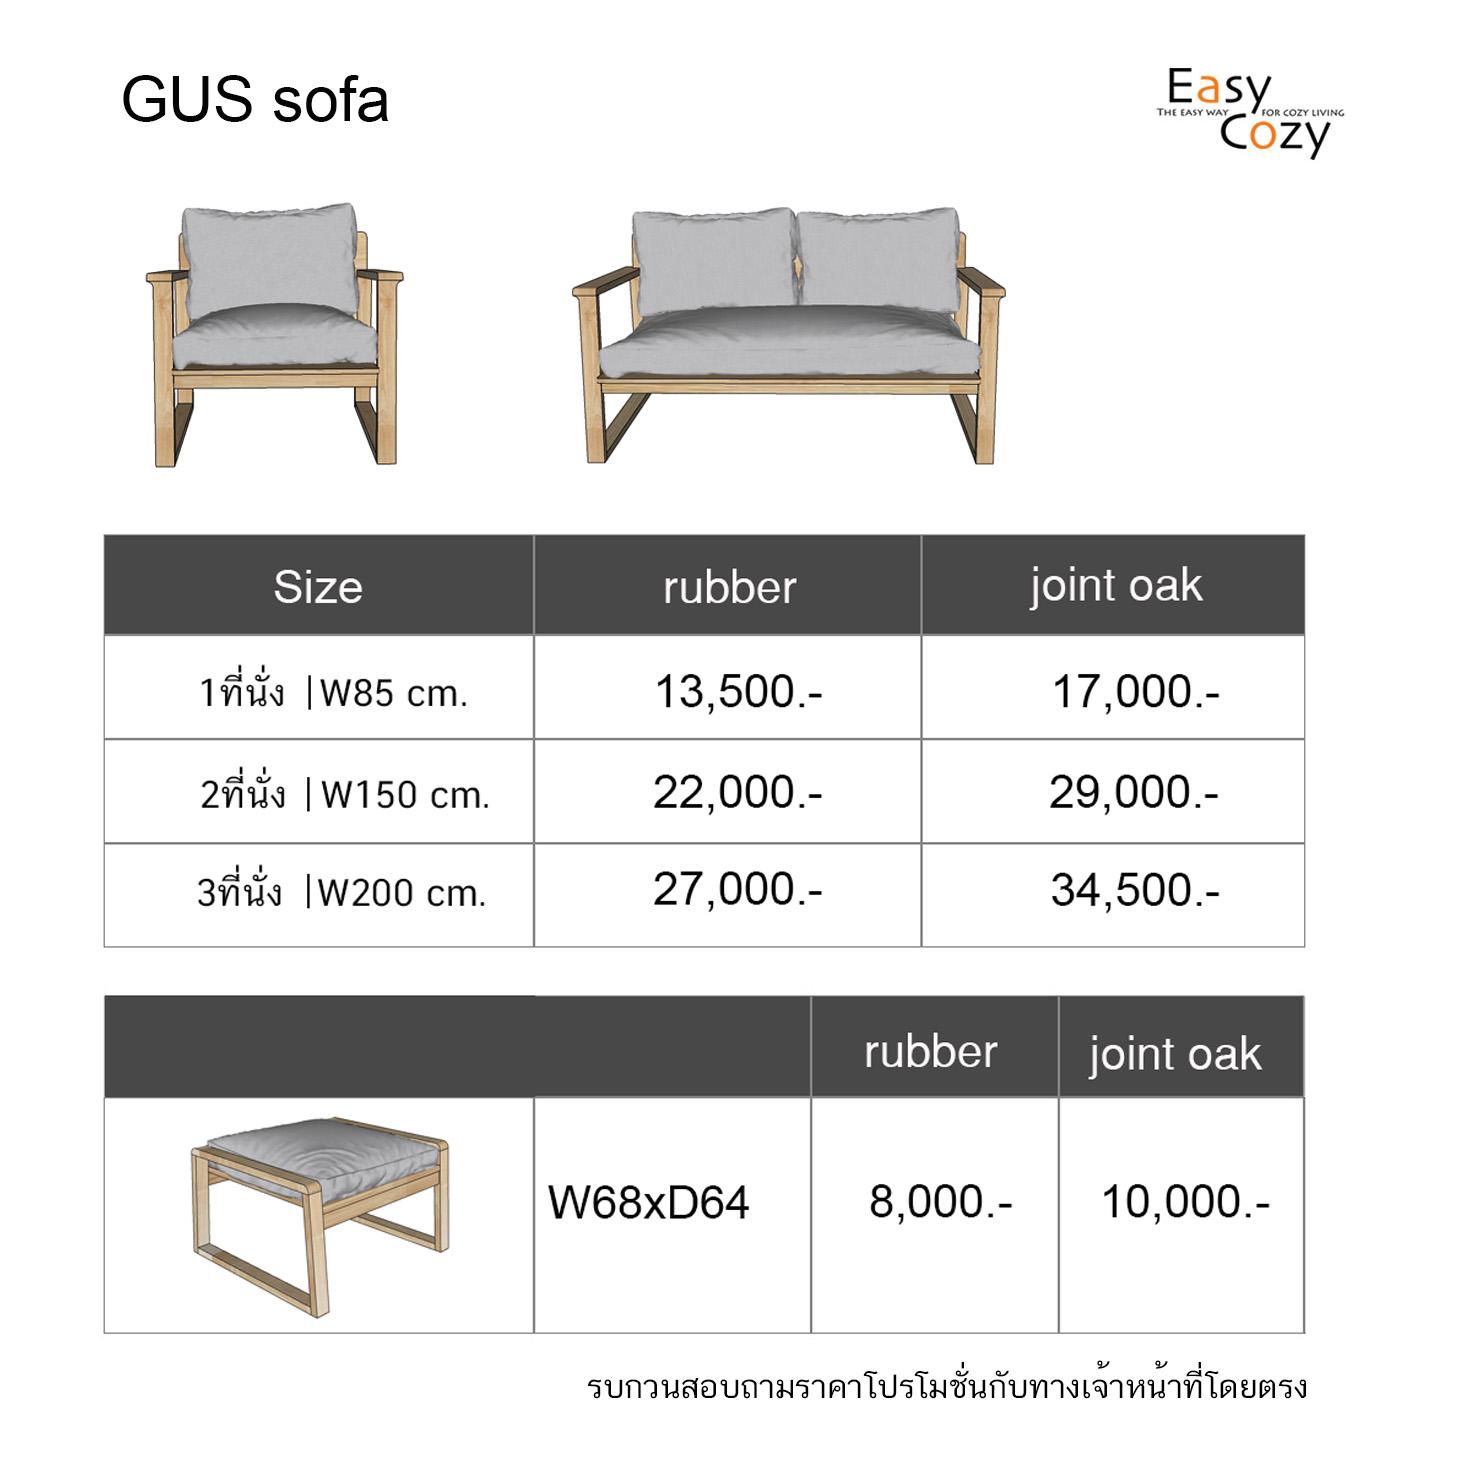 Gus sofa - website